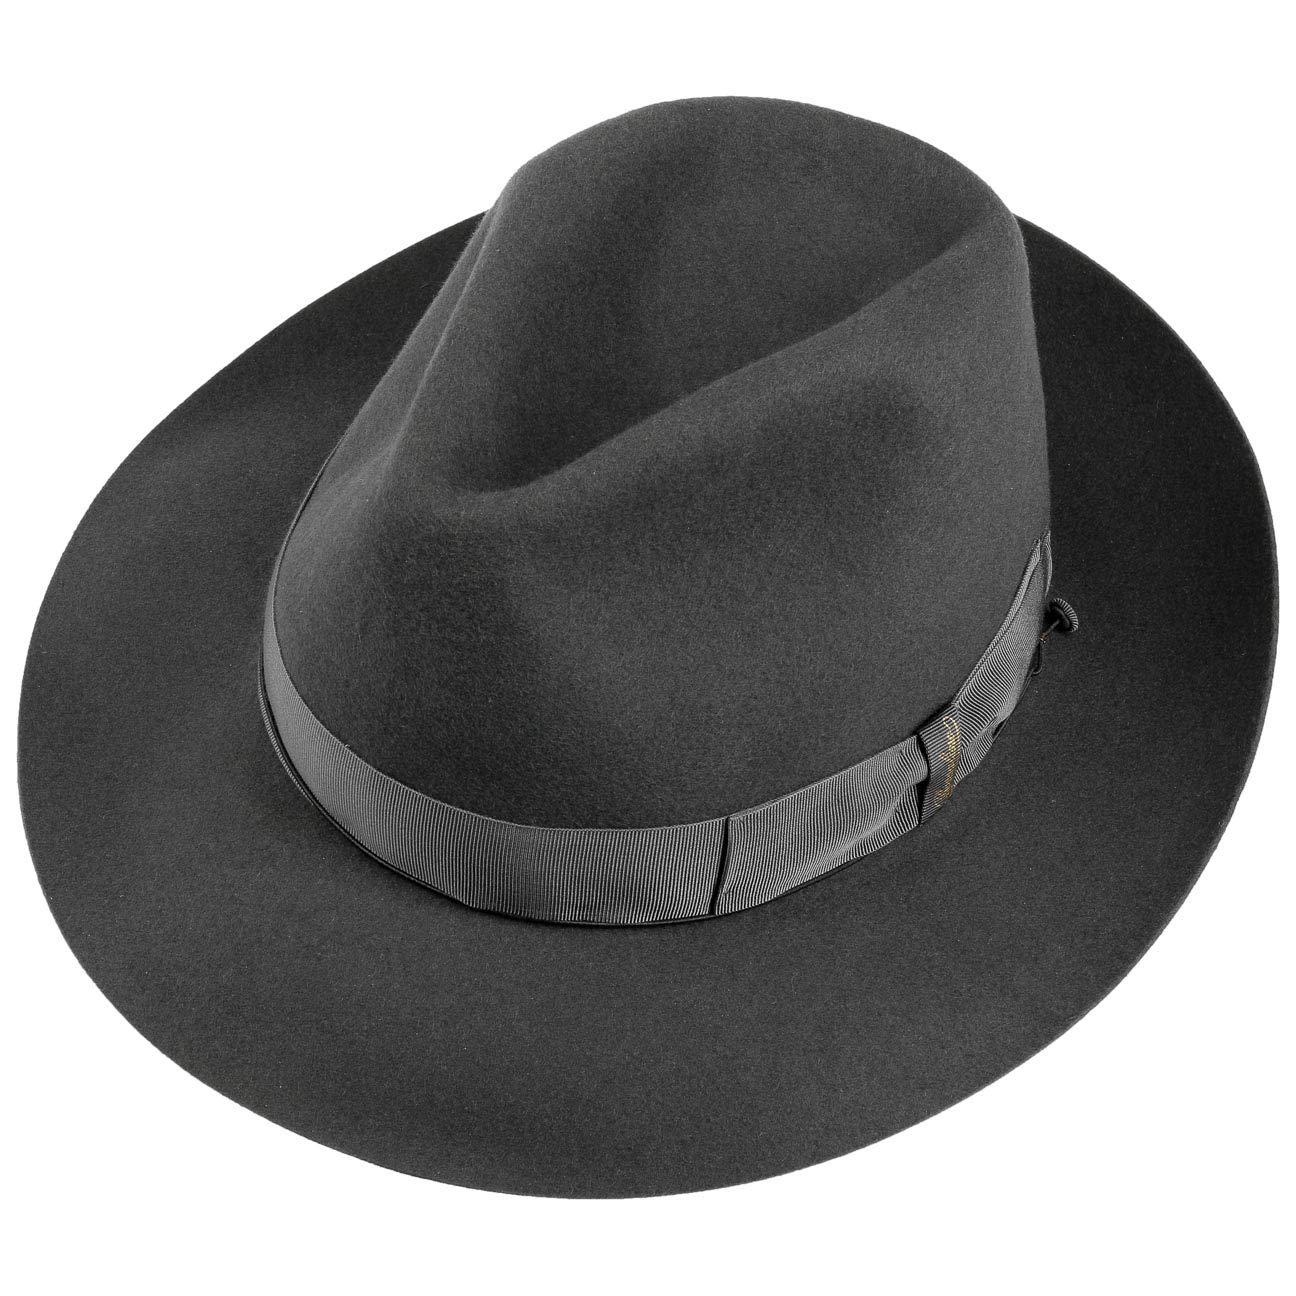 Borsalino Sombrero Fedora 50 Gramos by Sombreros de fieltrosombrero Hombre  (60 cm - Gris Oscuro)  Amazon.es  Ropa y accesorios 28d64488a1a